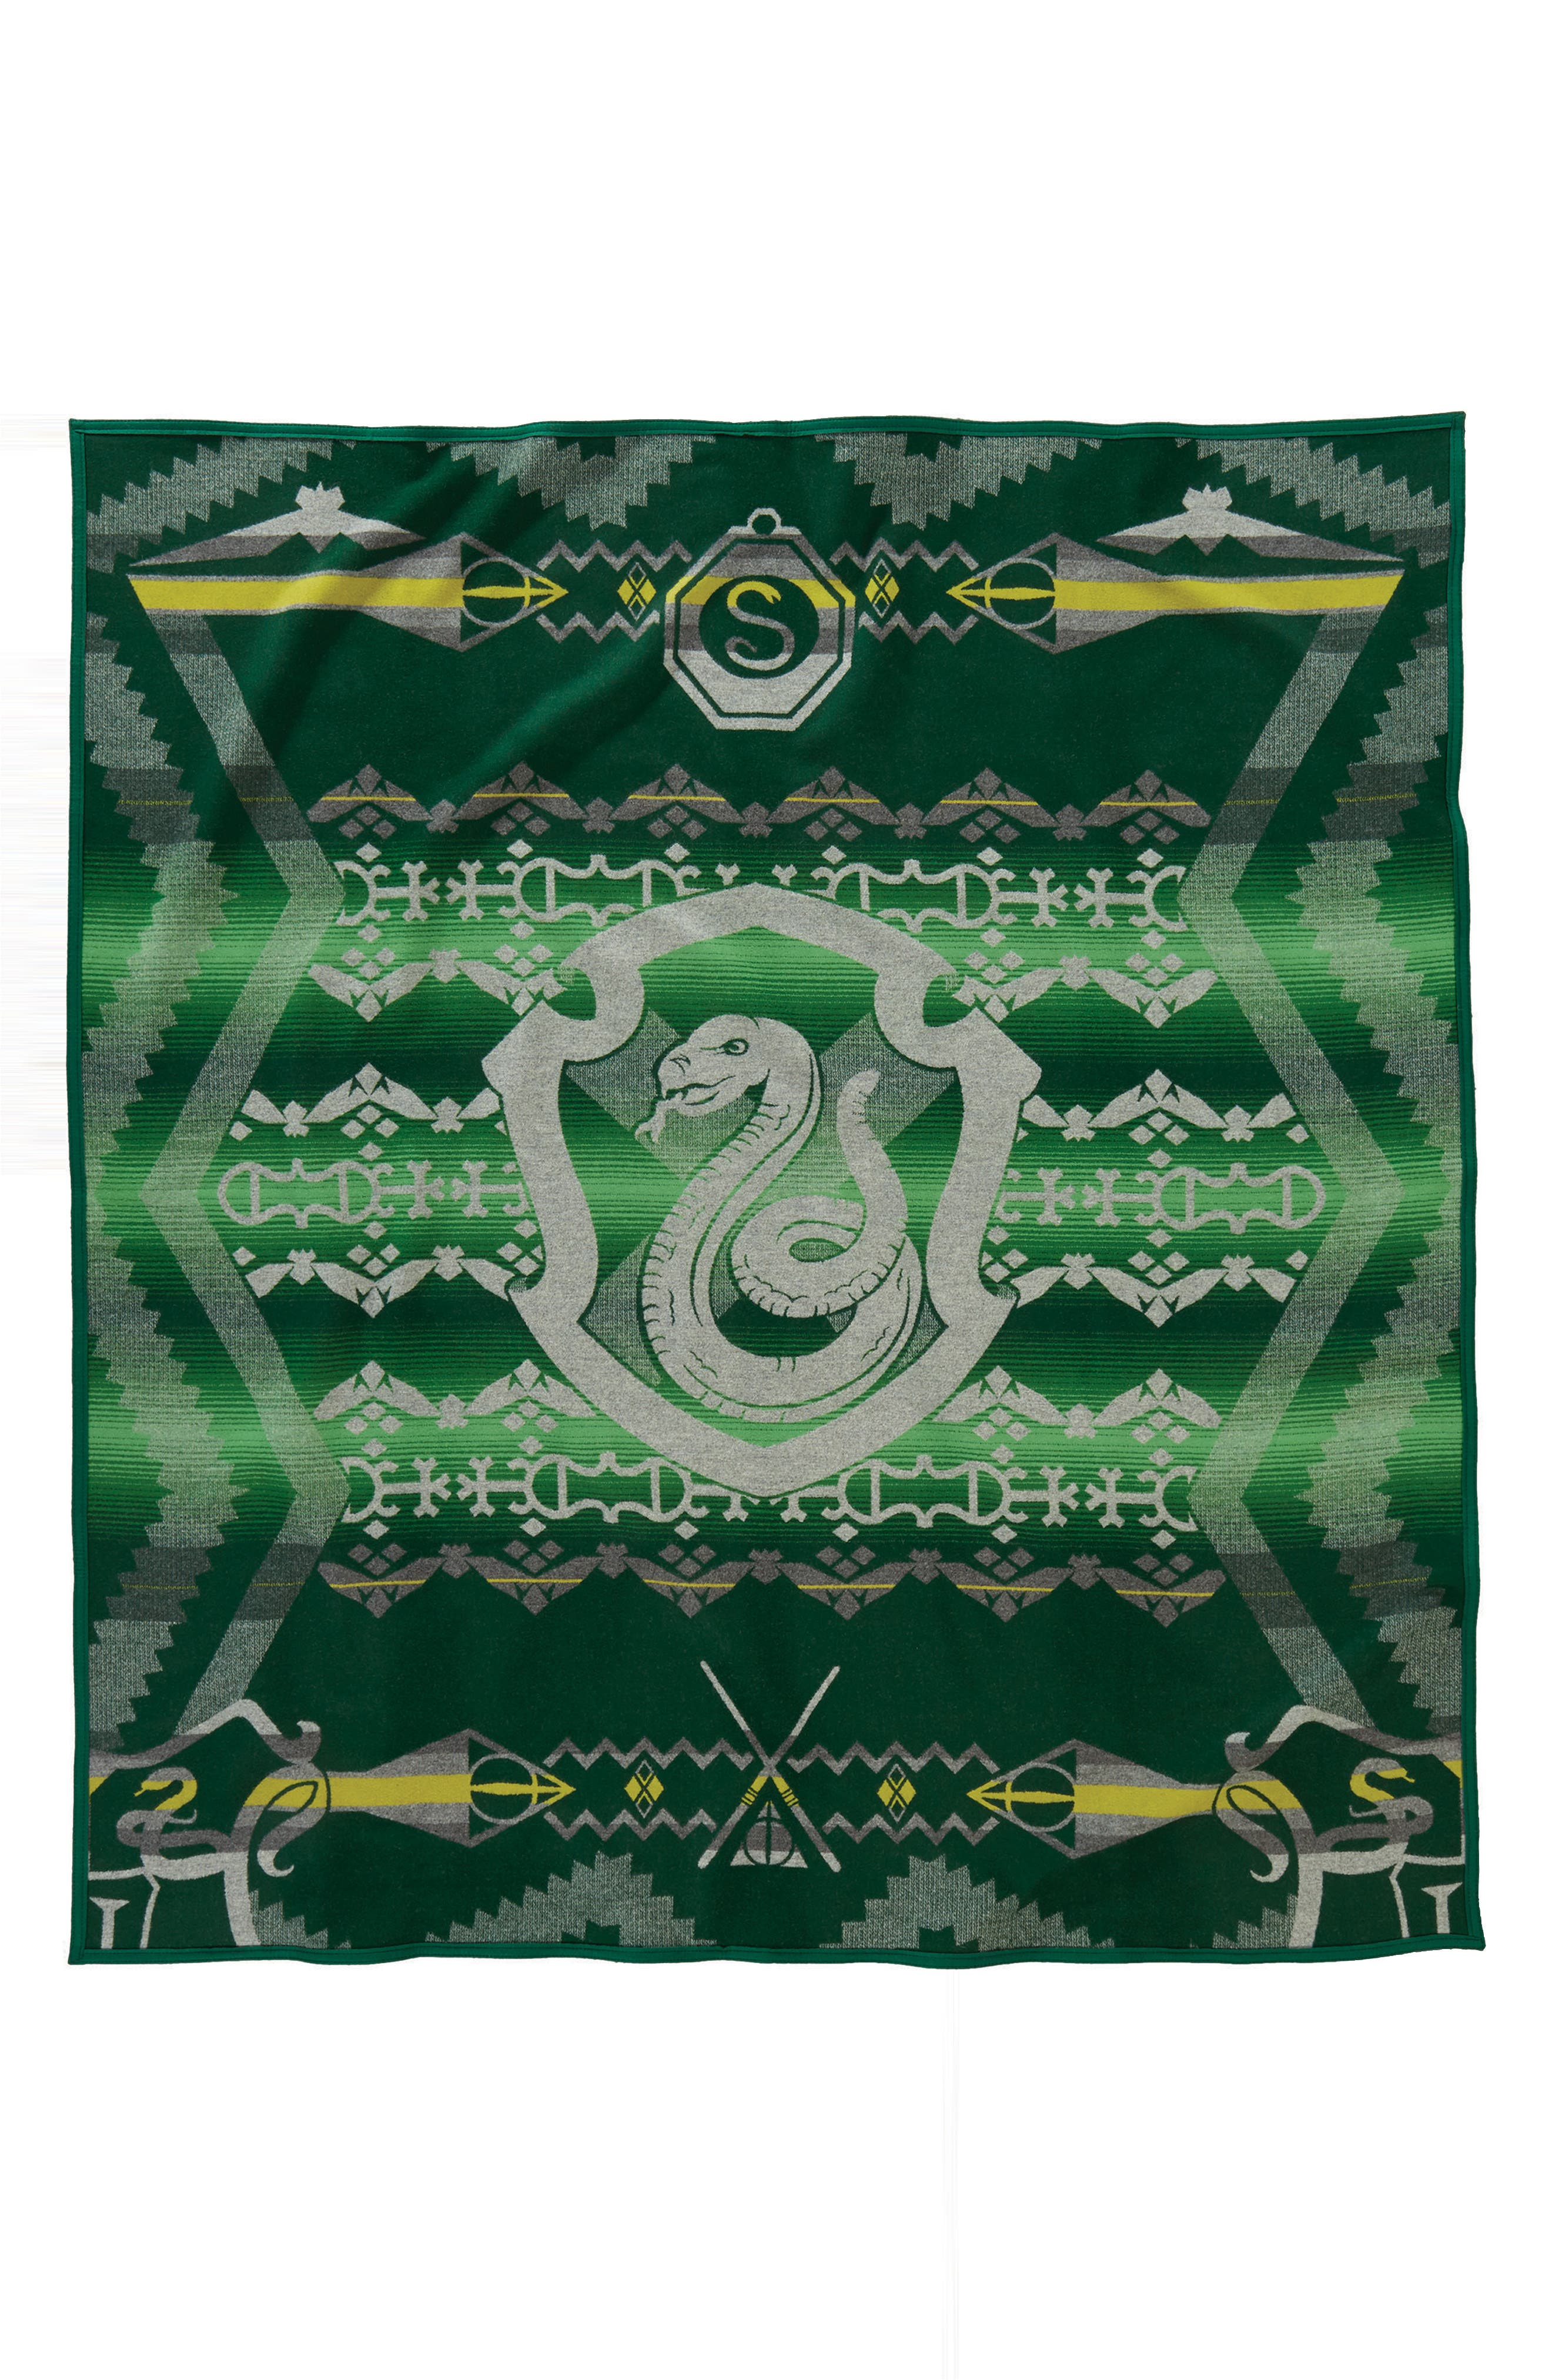 Harry Potter - Slytherin Blanket,                             Main thumbnail 1, color,                             300